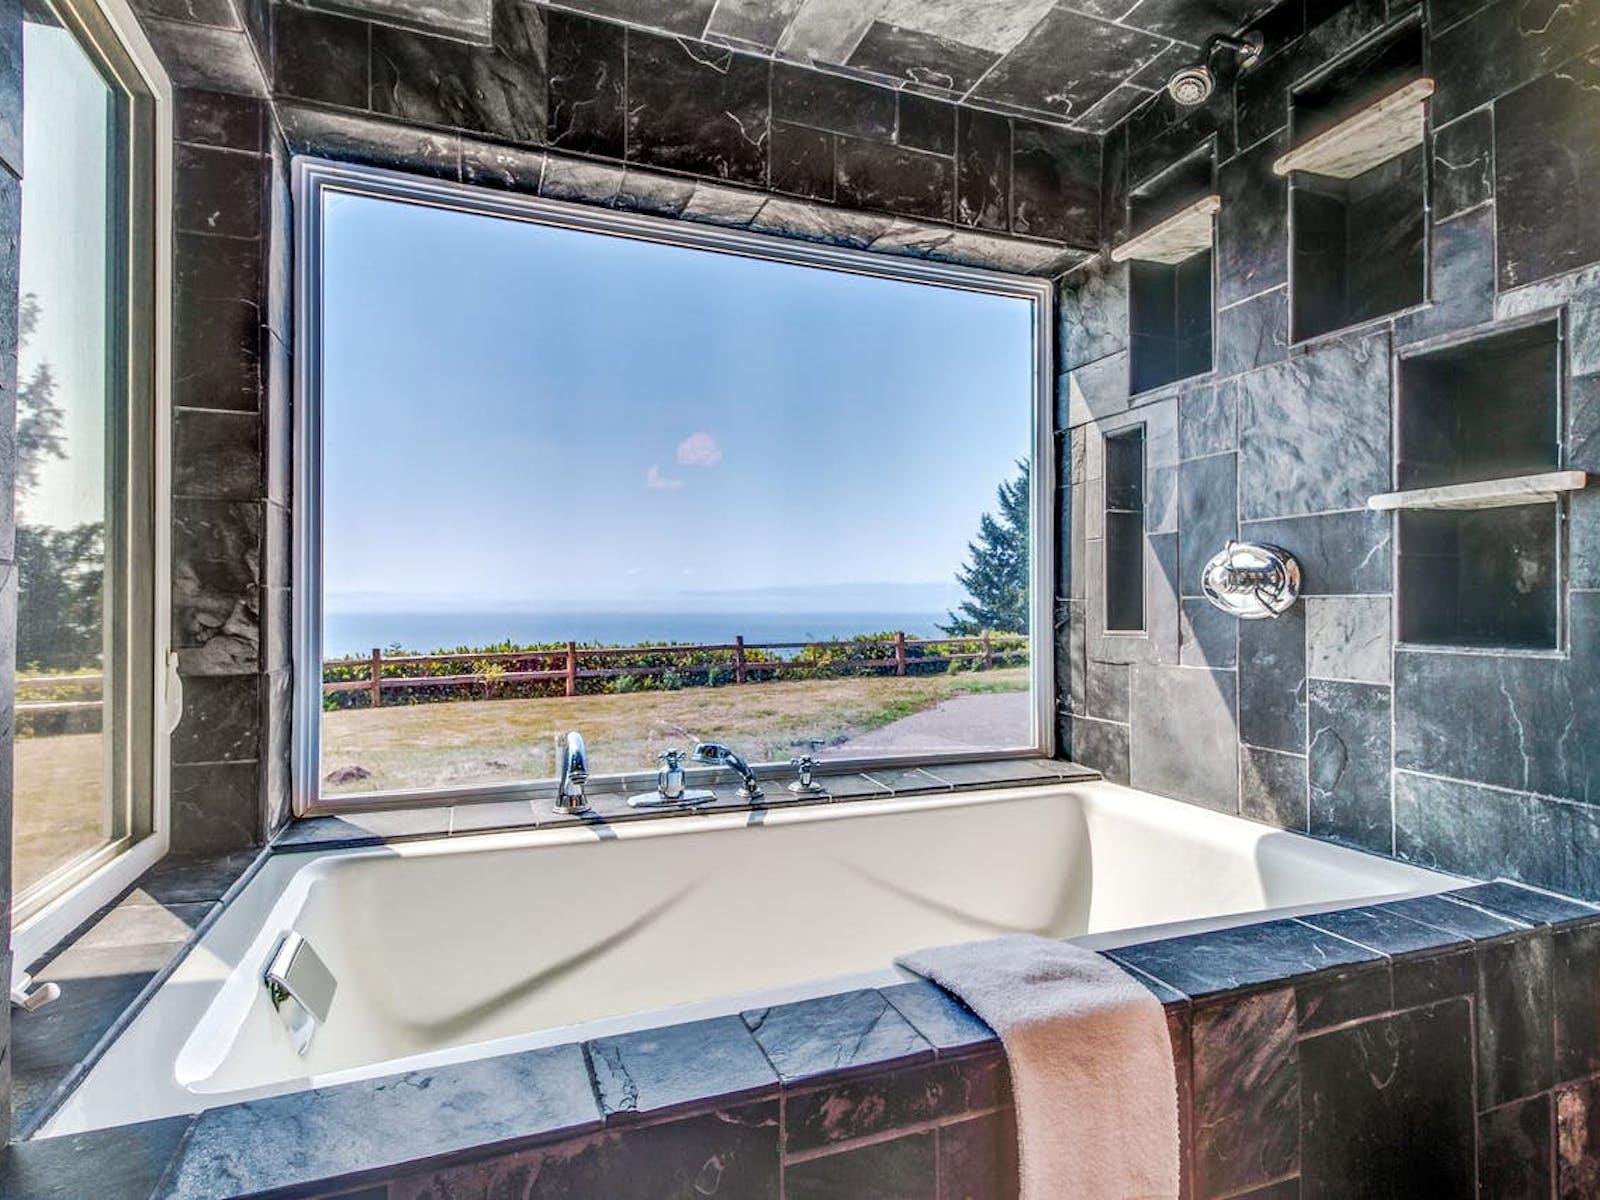 cast iron bathtub of neahkahnie, OR vacation rental